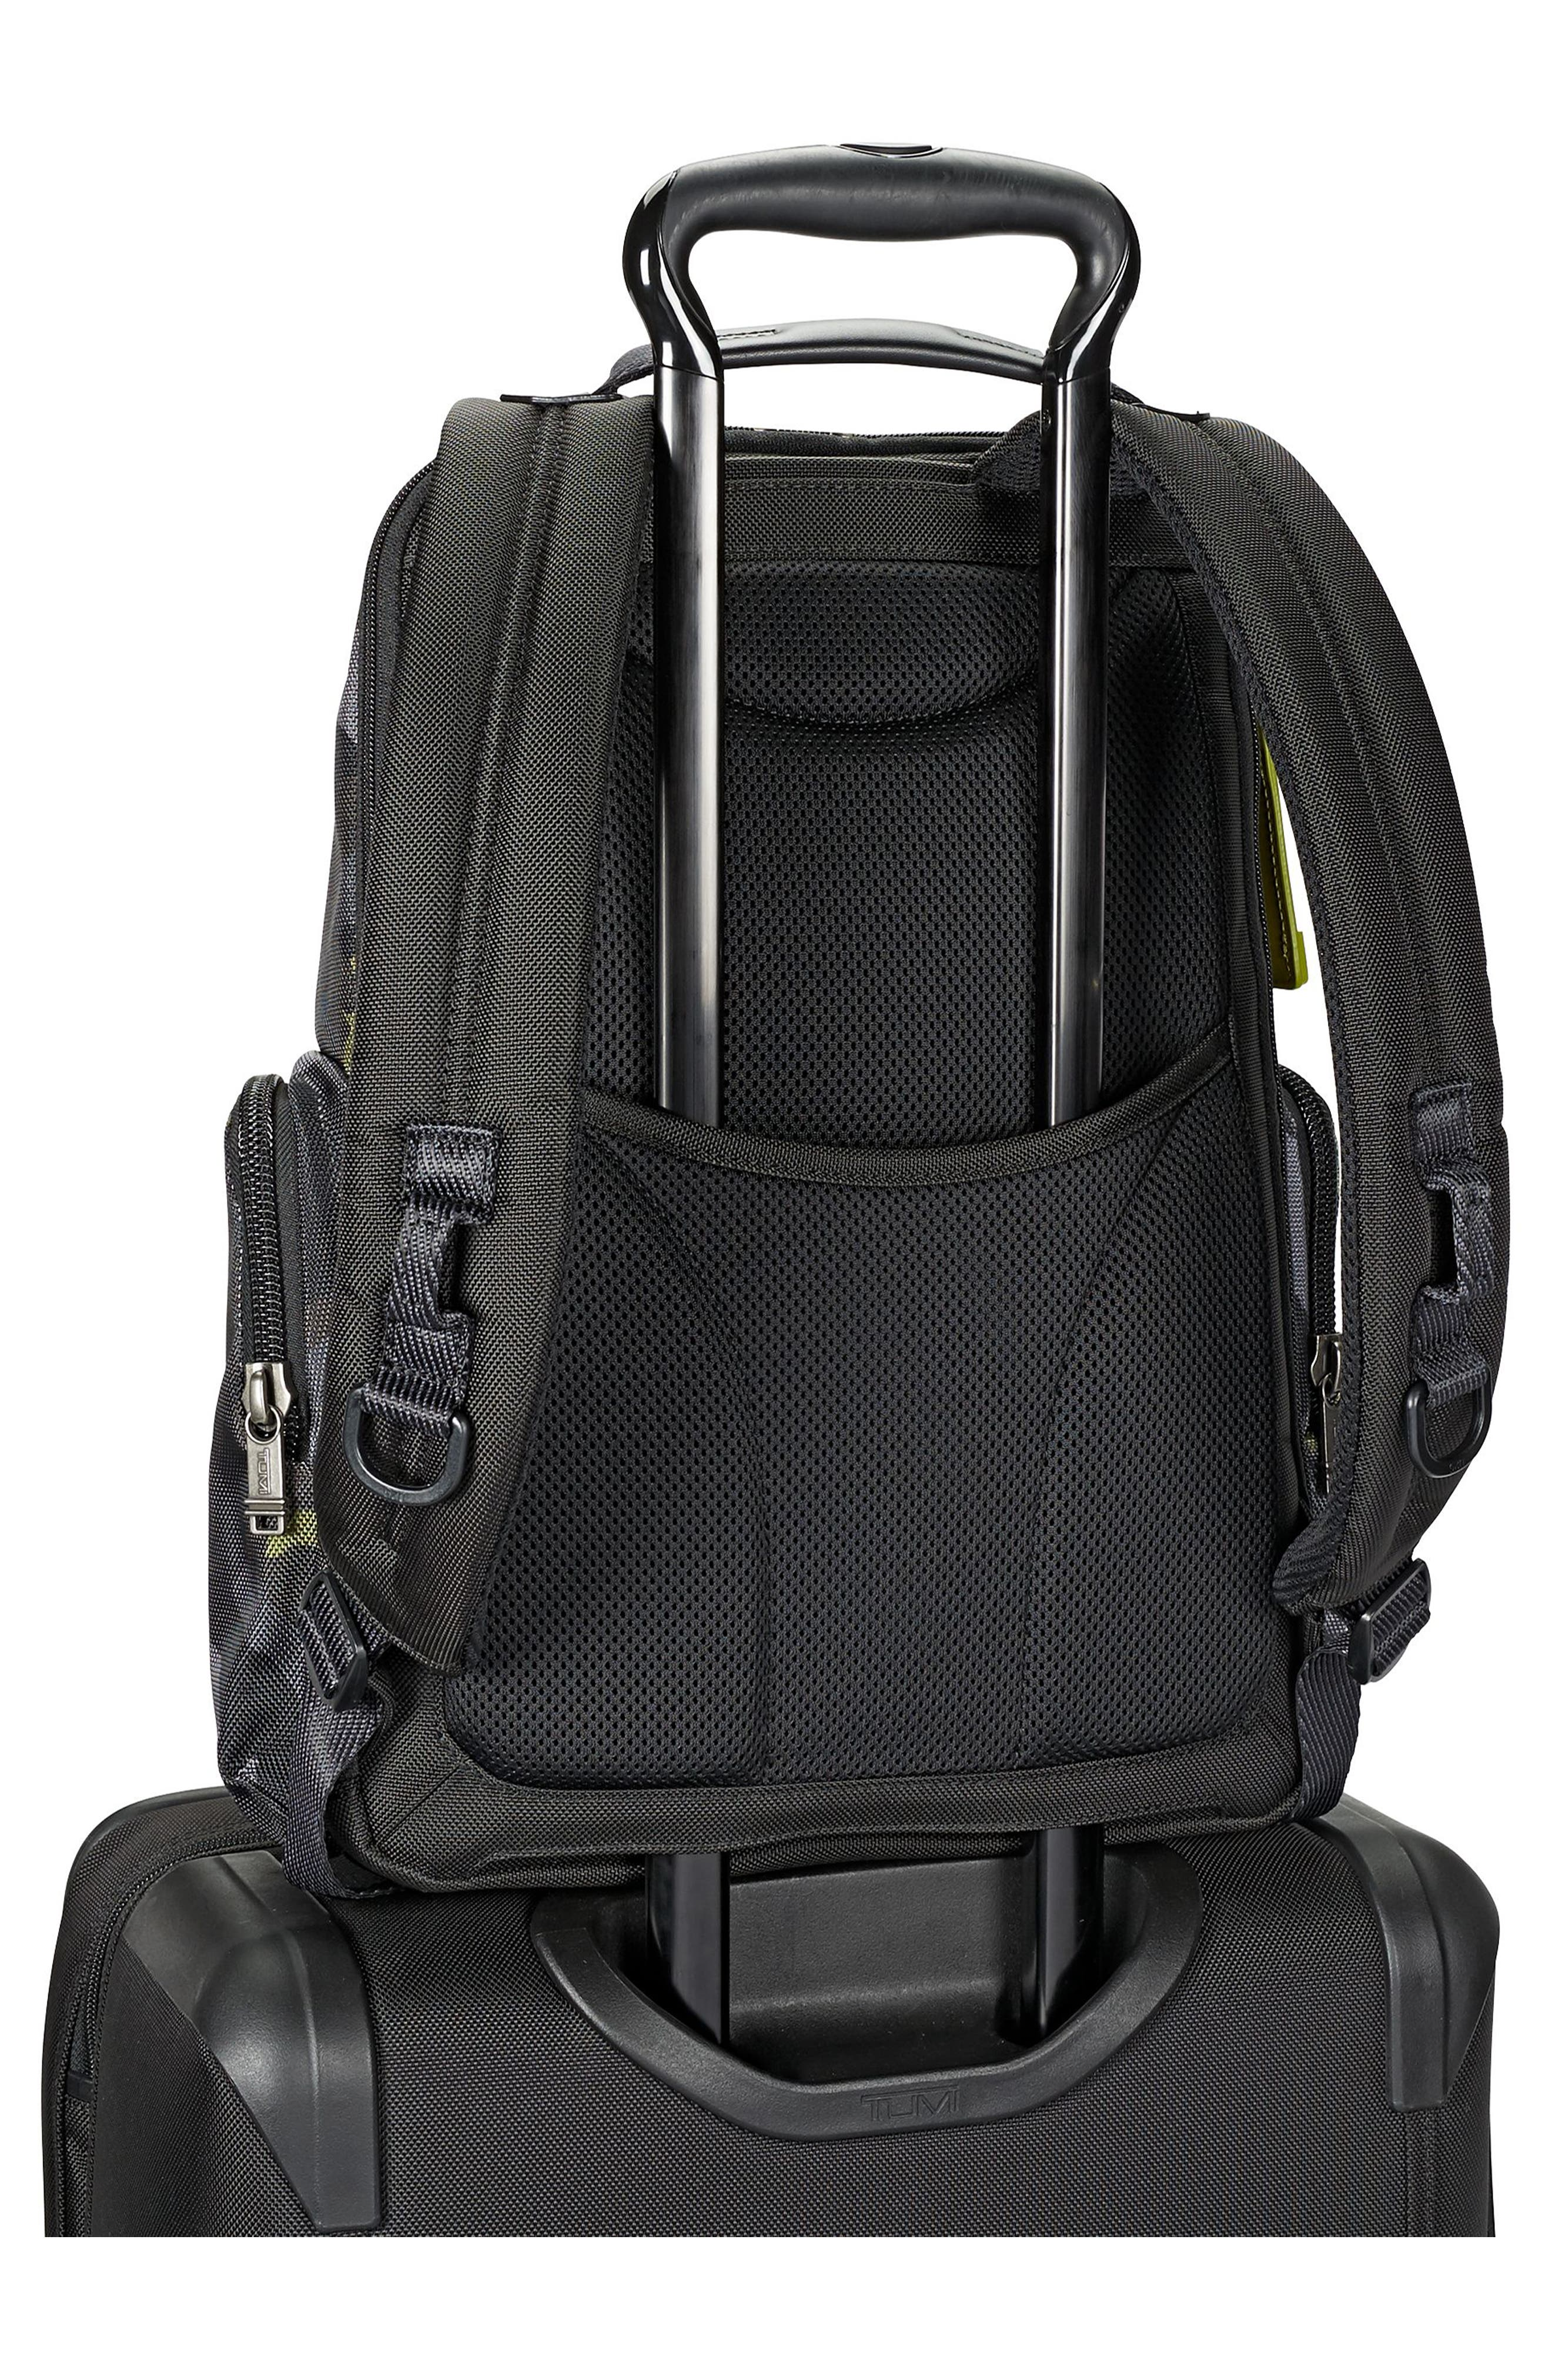 Alpha Bravo - Nellis Backpack,                             Alternate thumbnail 2, color,                             314